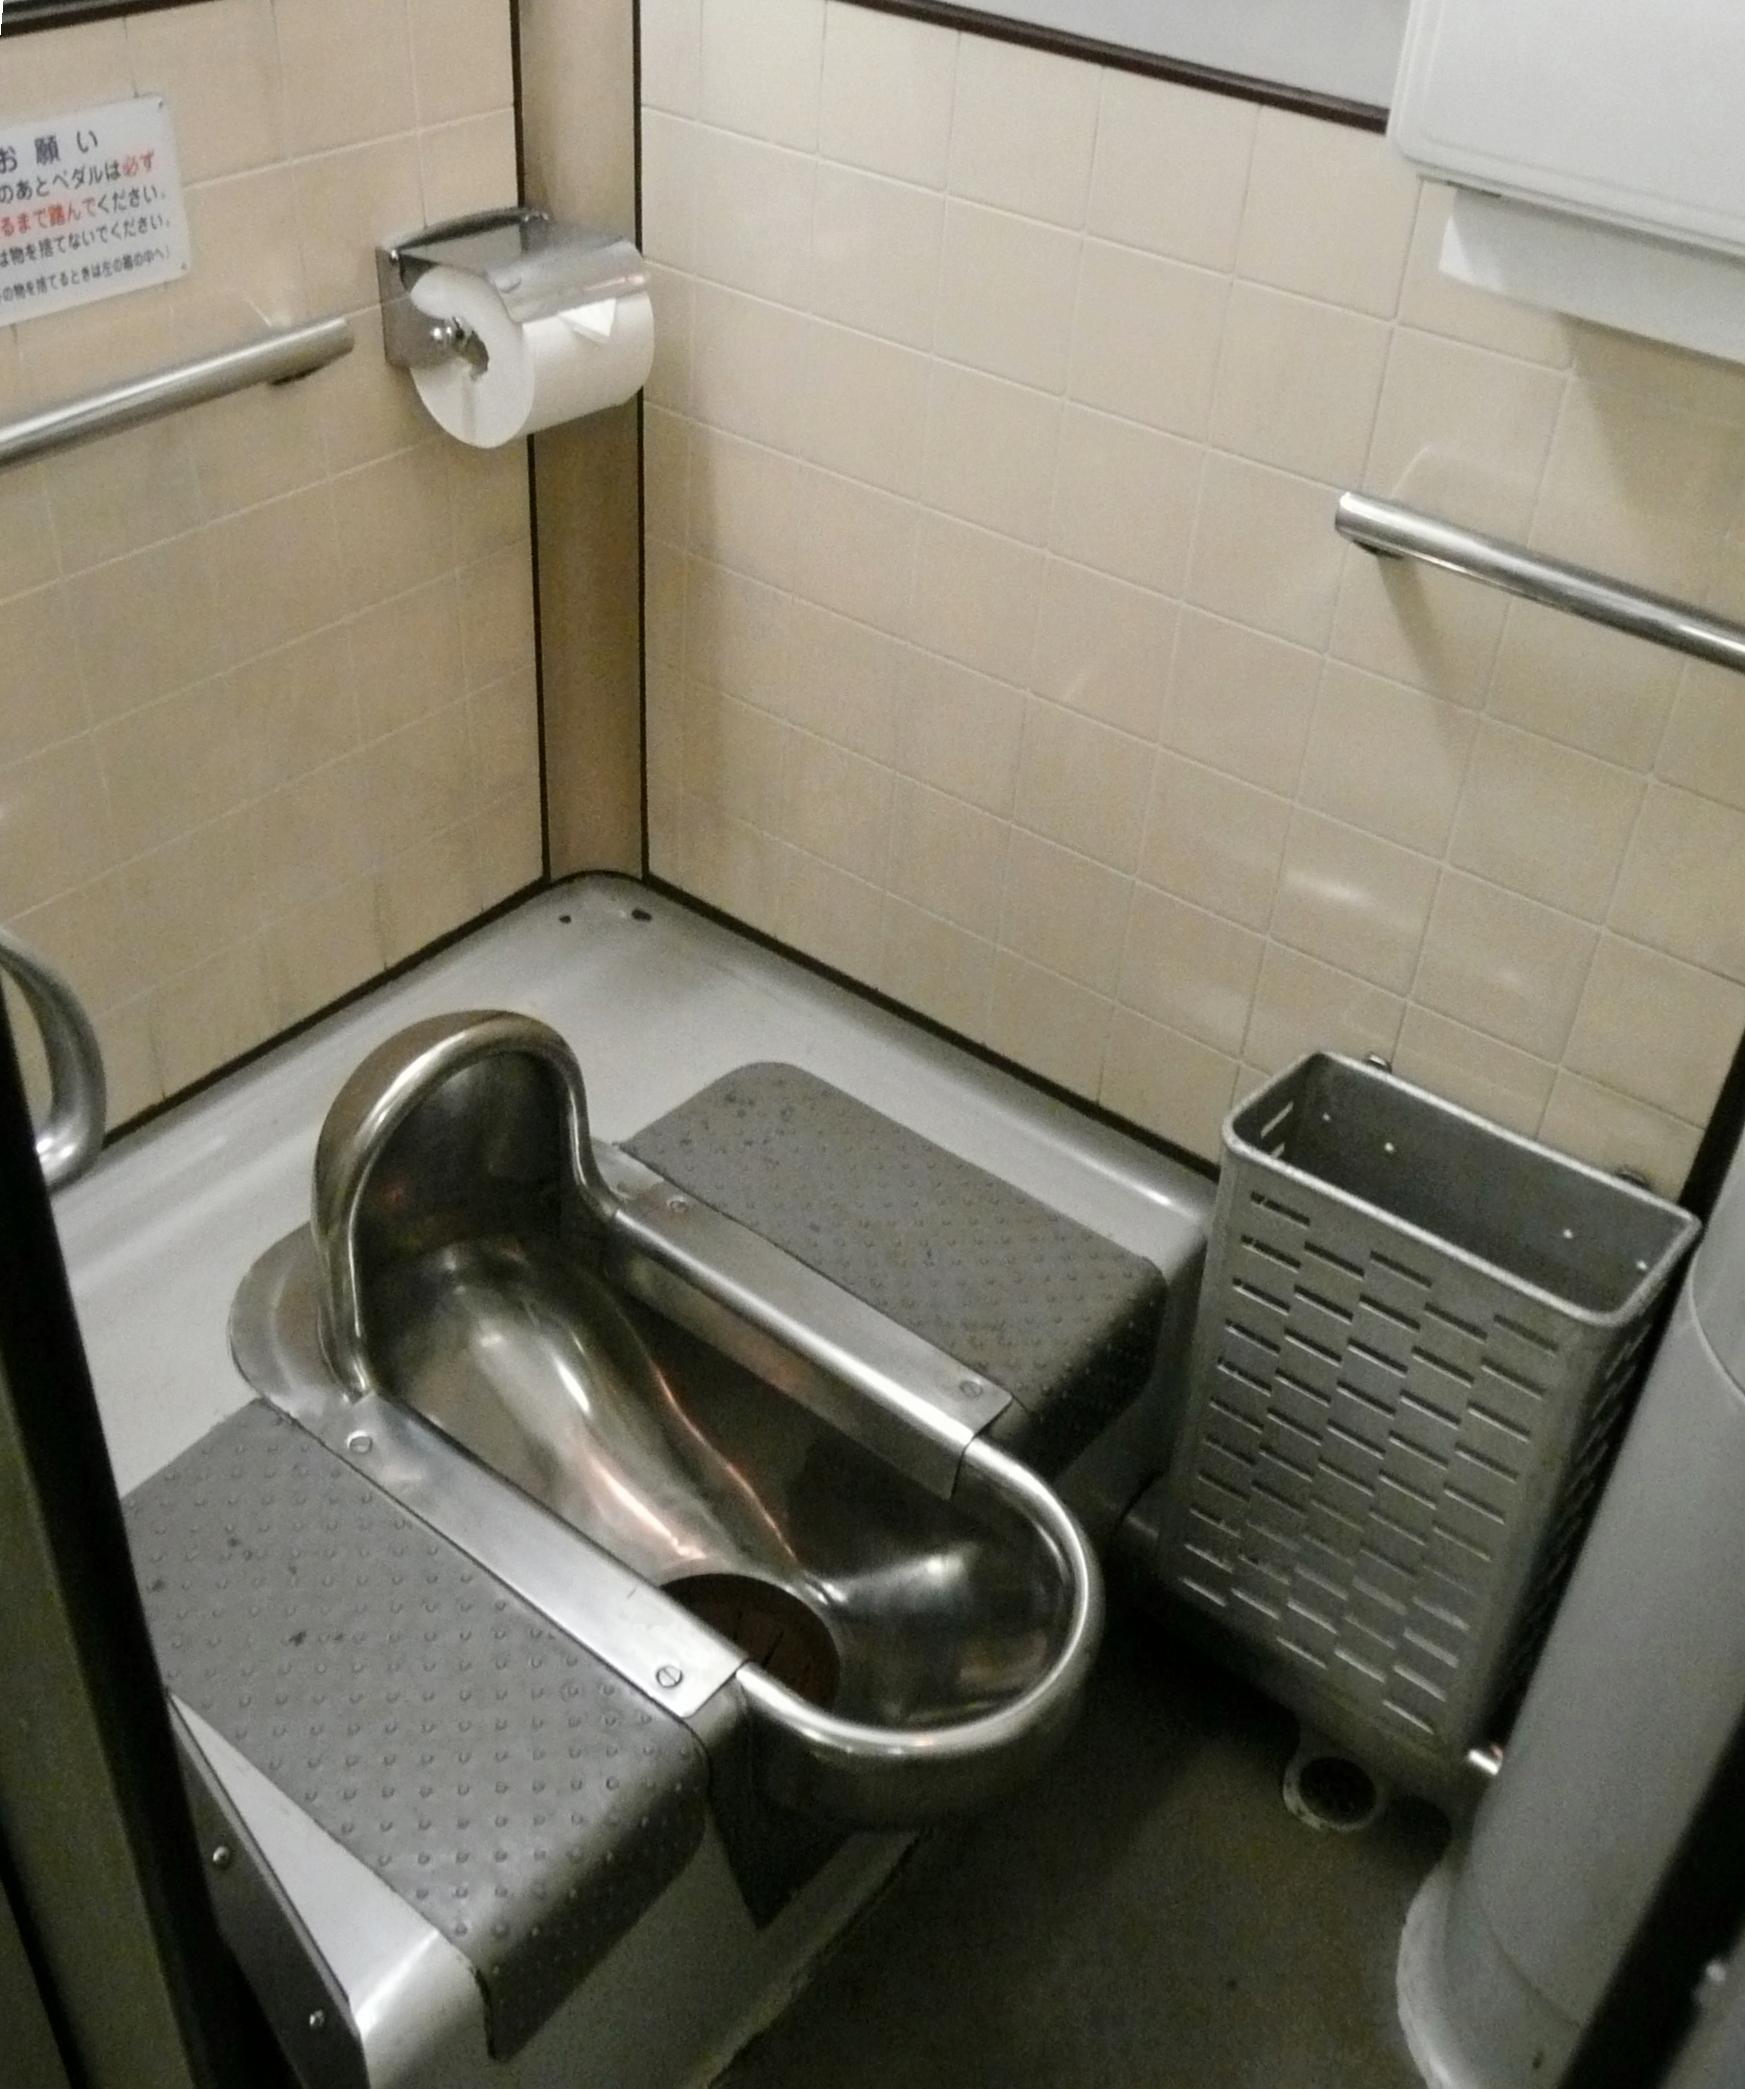 file ginga train japanese style wikimedia commons. Black Bedroom Furniture Sets. Home Design Ideas